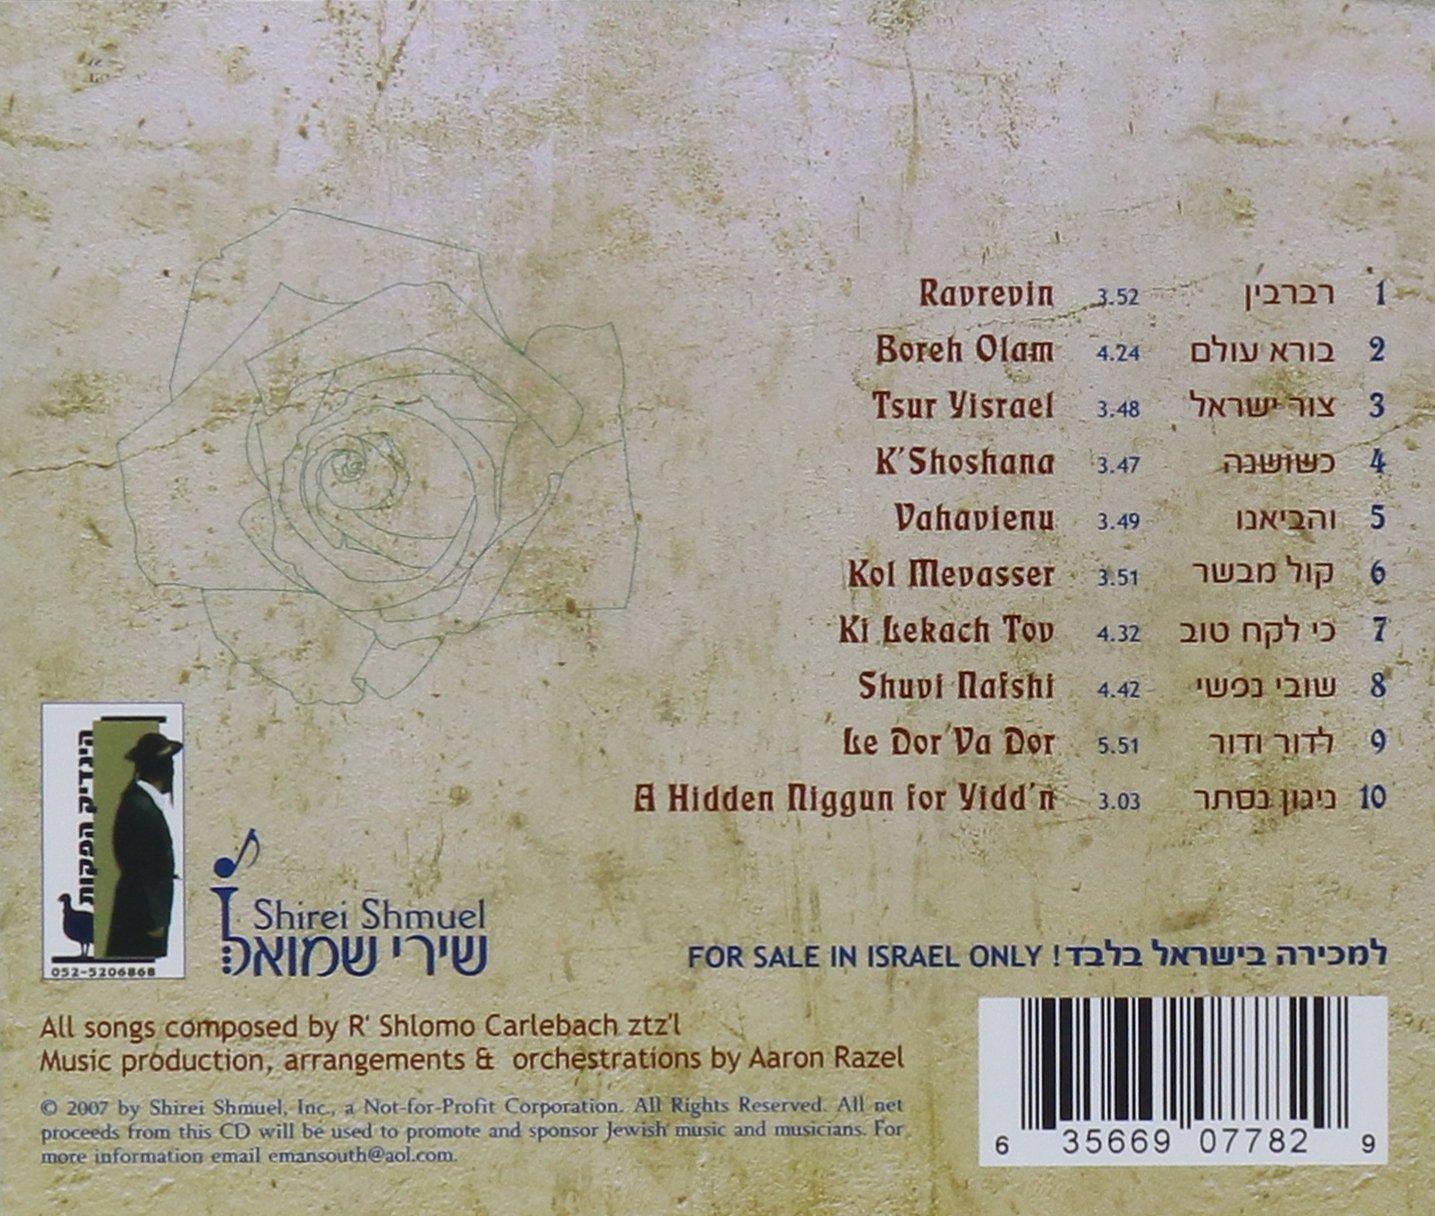 Aaron Razel, Shlomo Katz & Chaim Dovid - K\'shoshana - Amazon.com Music